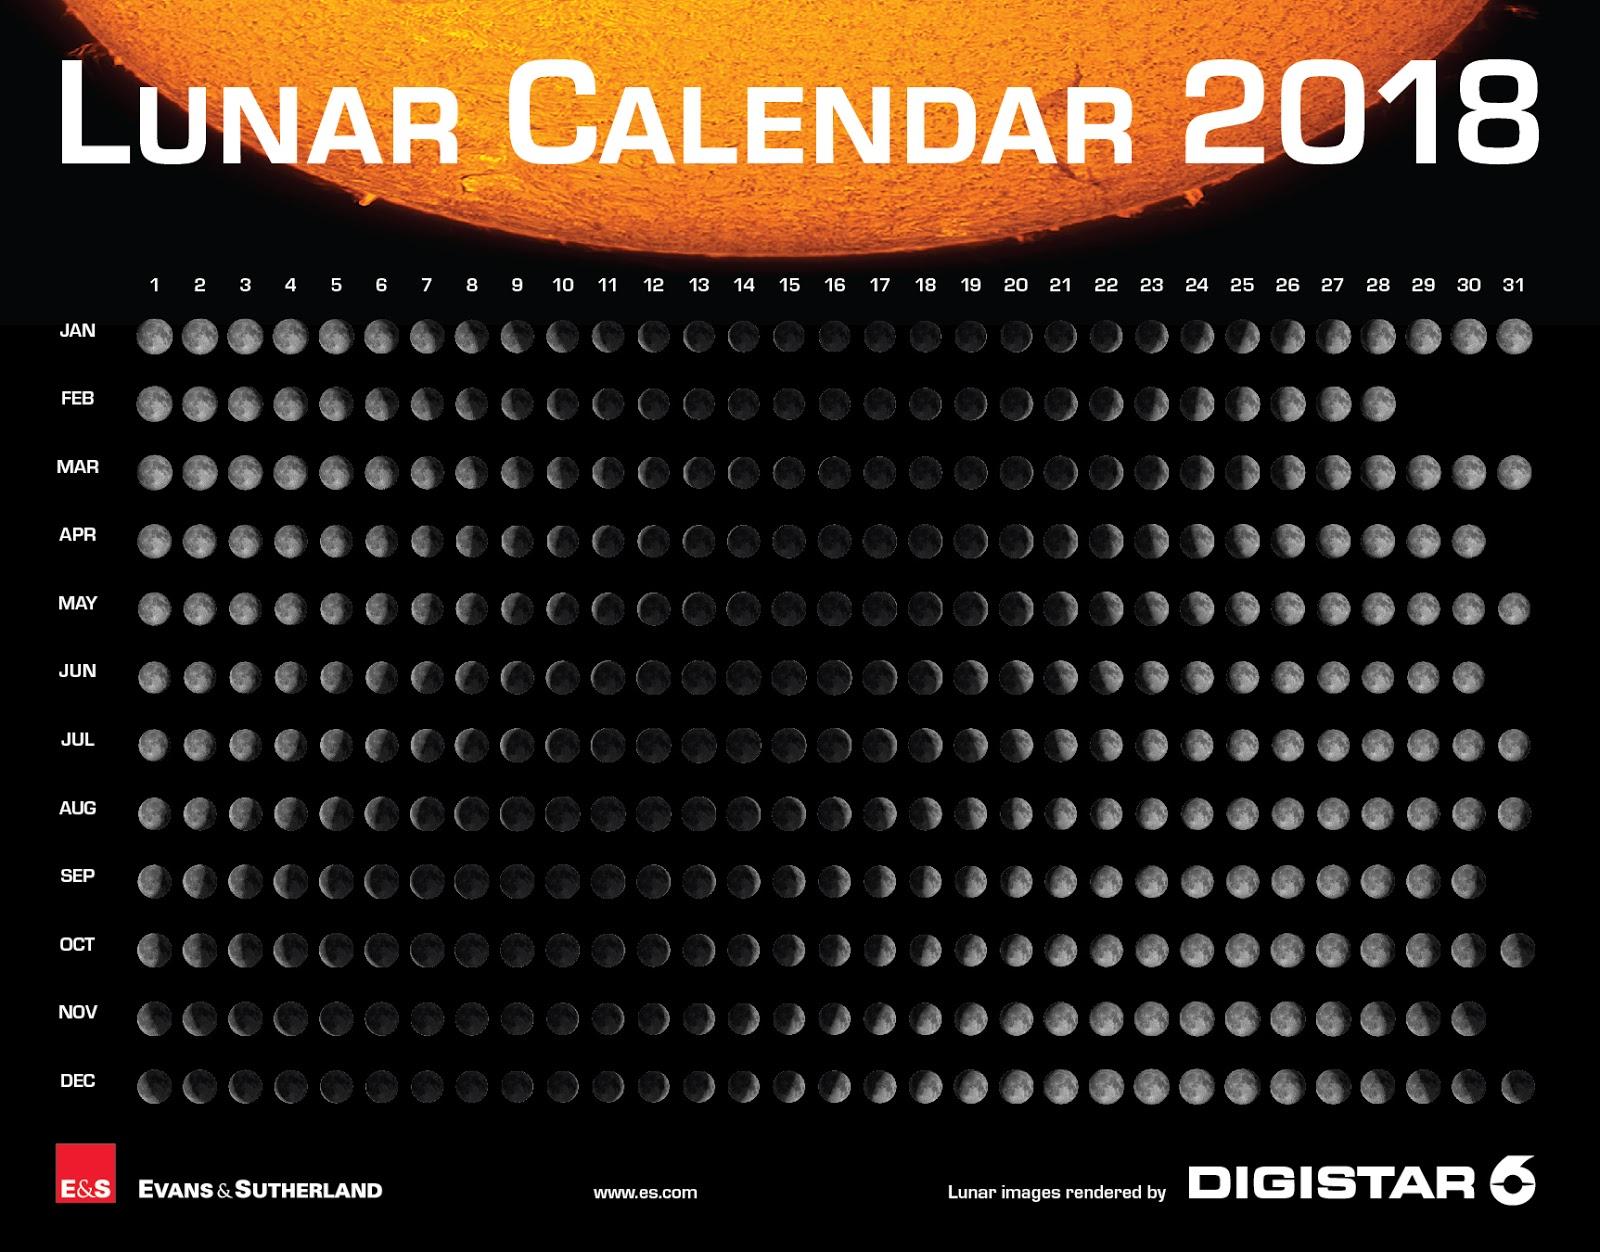 My Malice And Bias: Understanding Sikh Calendar Issue throughout Lunar Calendar Birthday Conversion